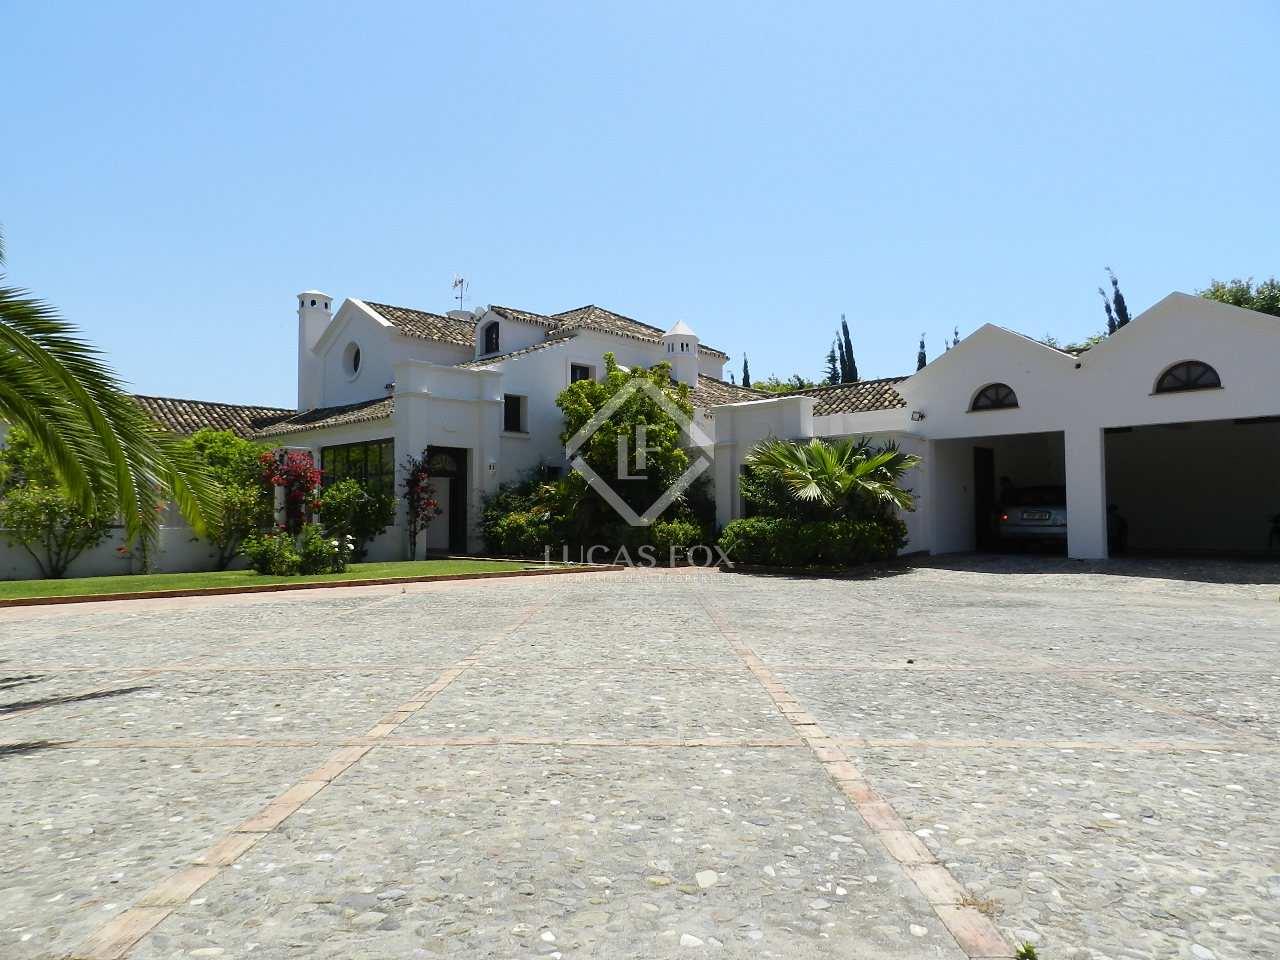 Maison villa de 700m a vendre san pedro de alc ntara guadalmina - Maison a vendre san francisco ...